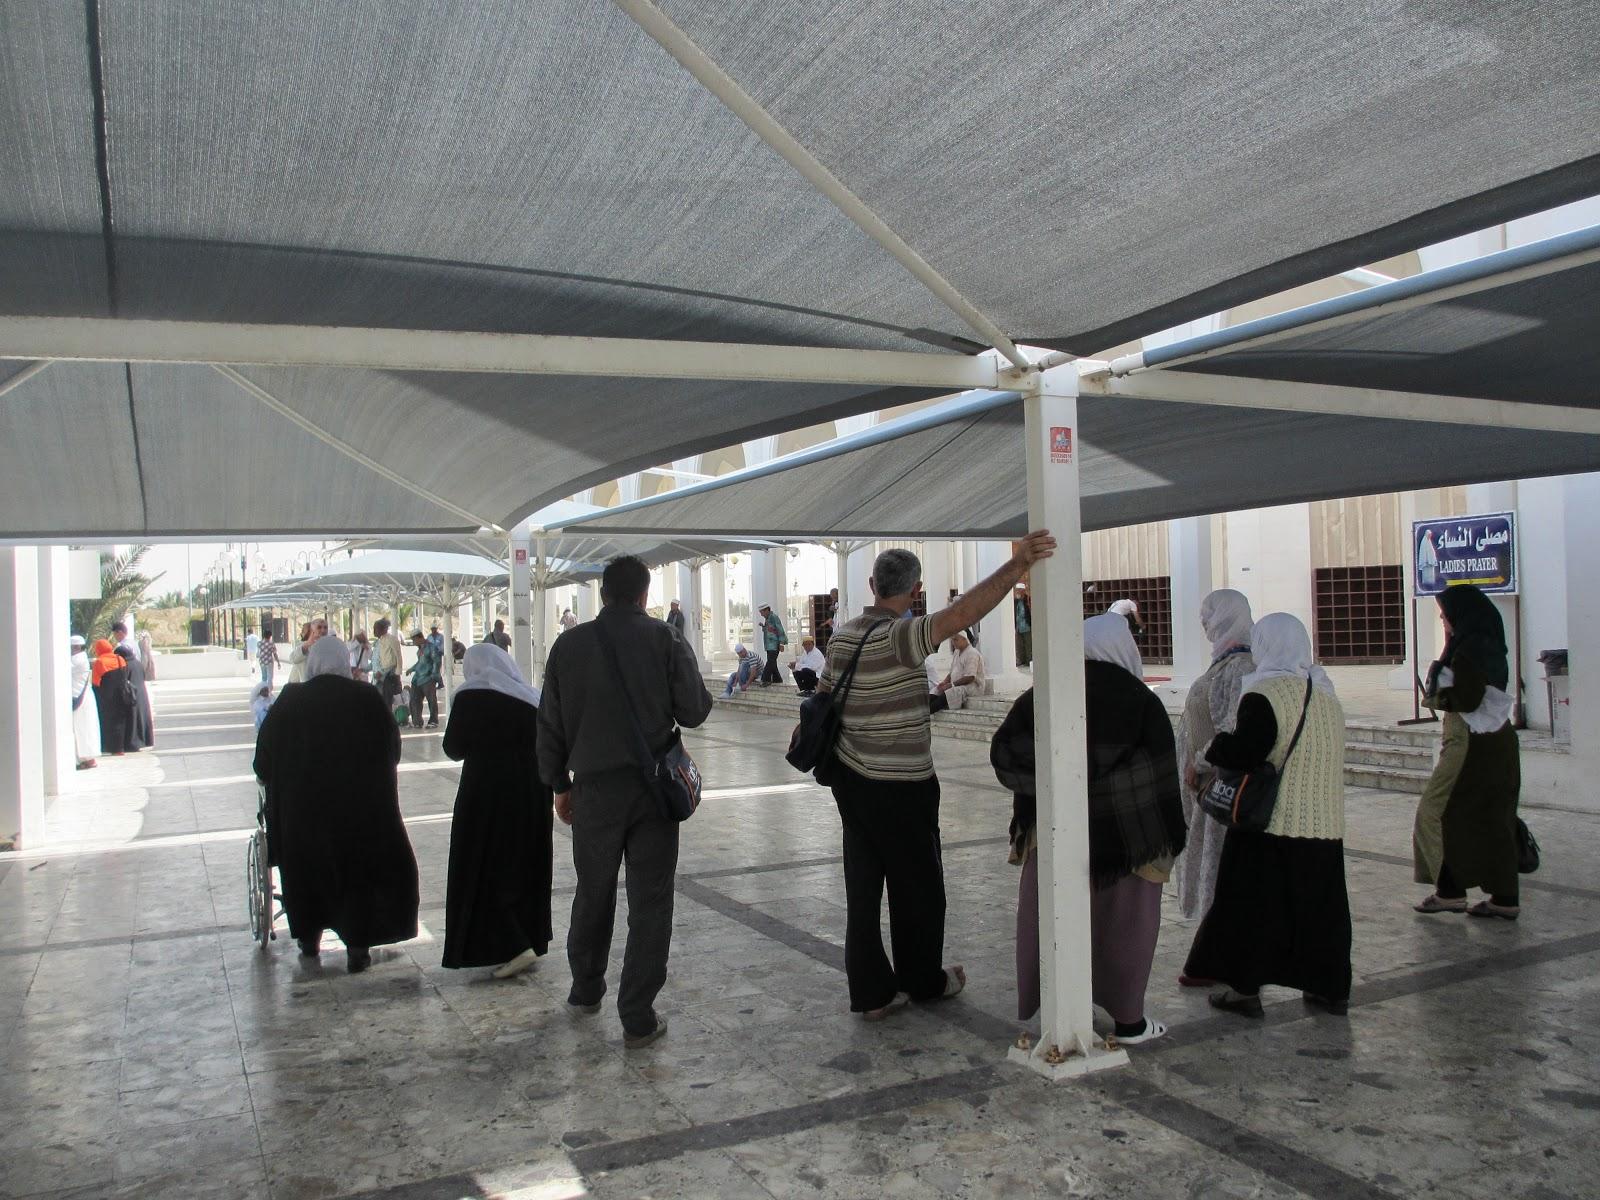 Travel Umroh Plus Turki Desember 2014 Aman Nyaman dan Terpercaya